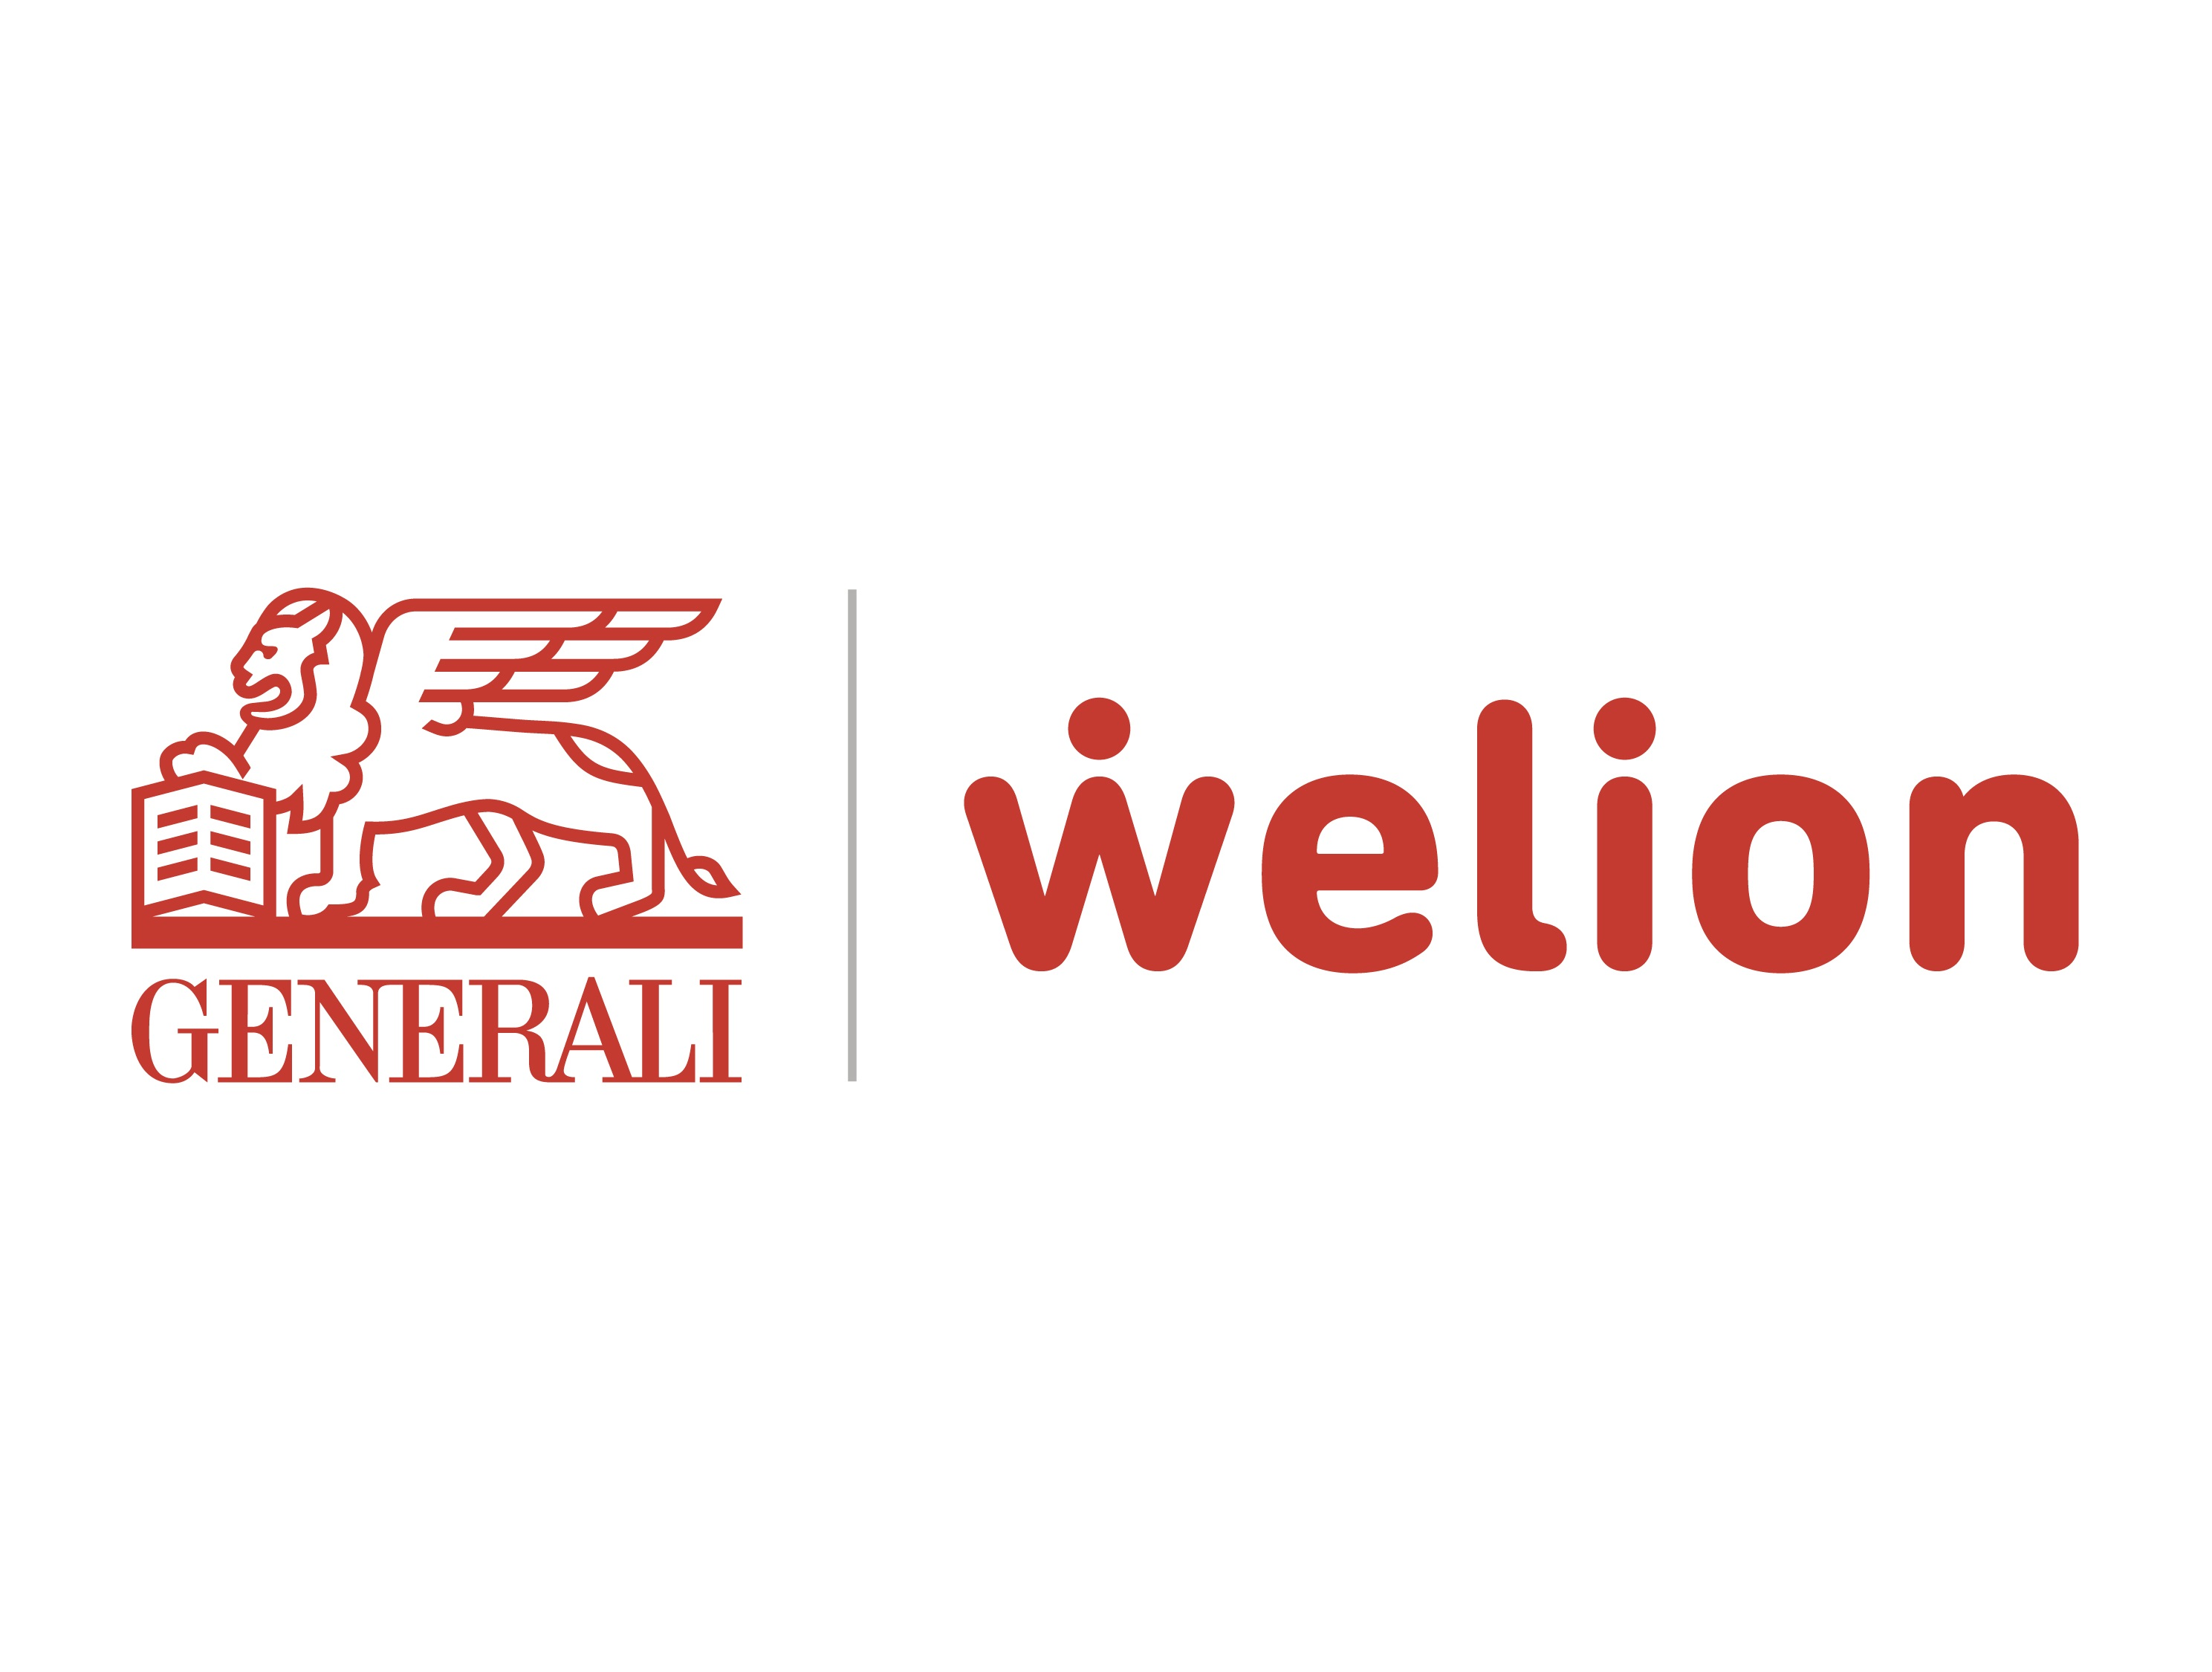 welion generali